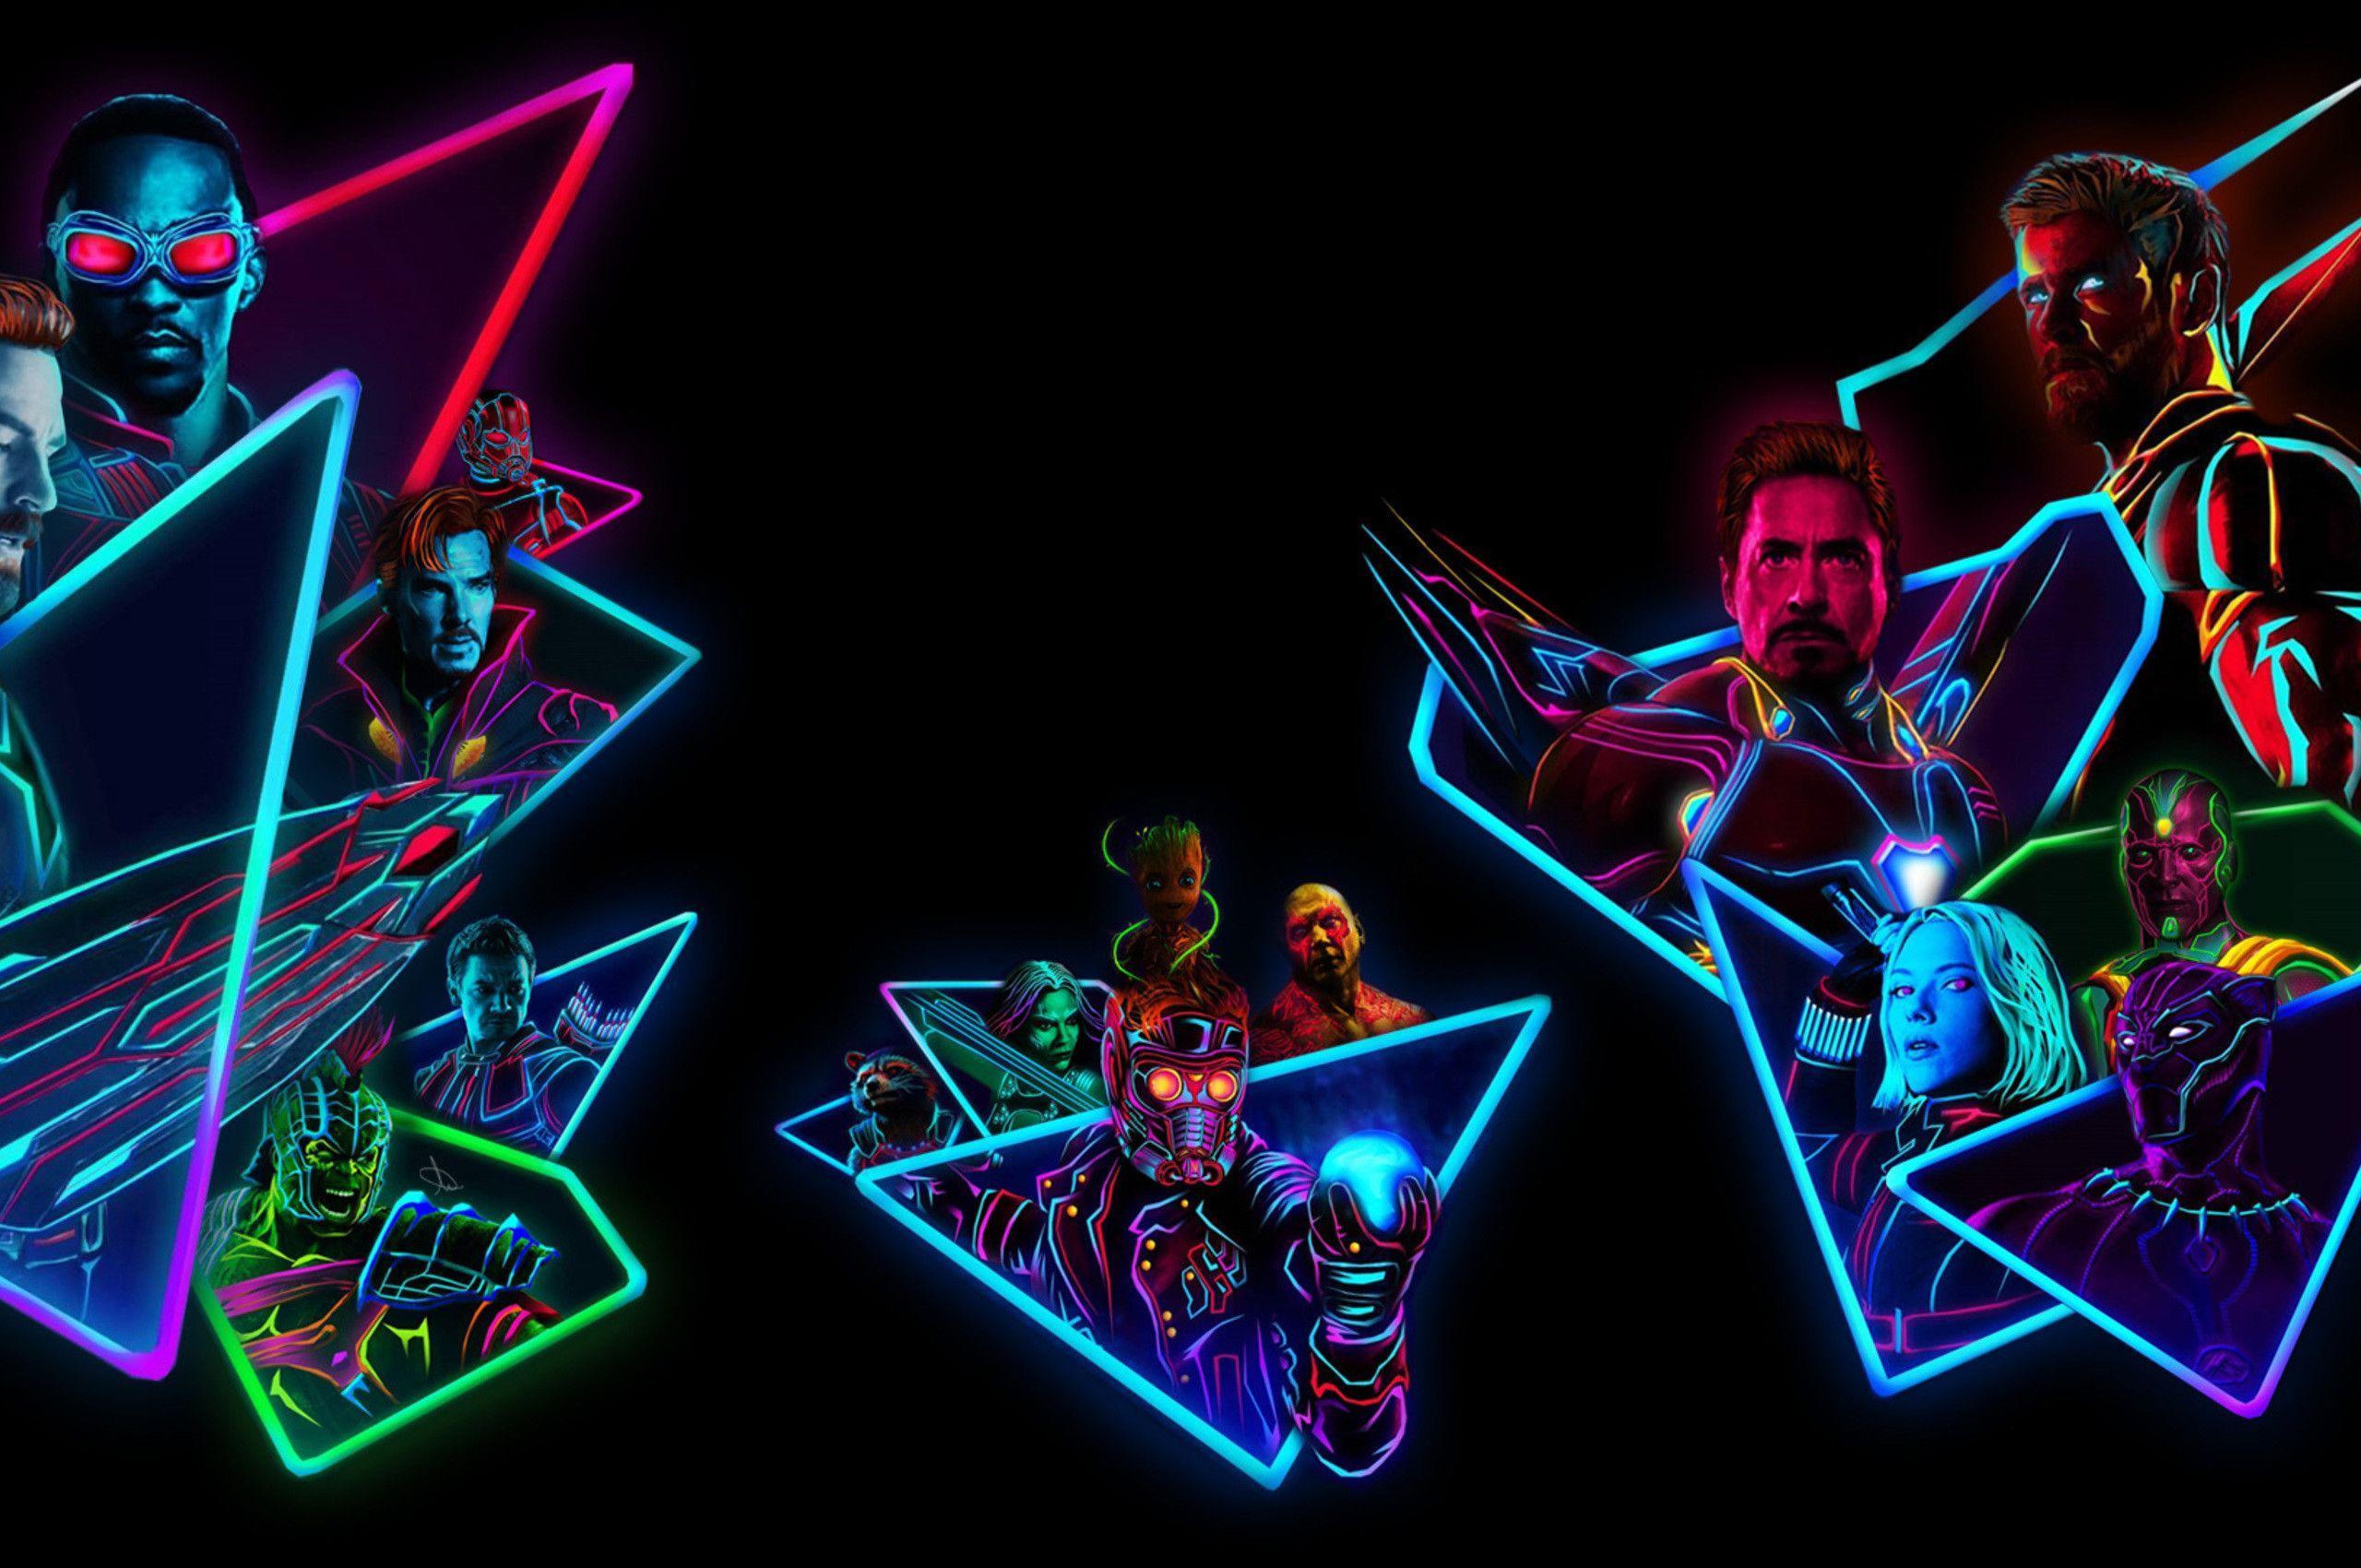 Neon Avengers Wallpapers - Top Free ...